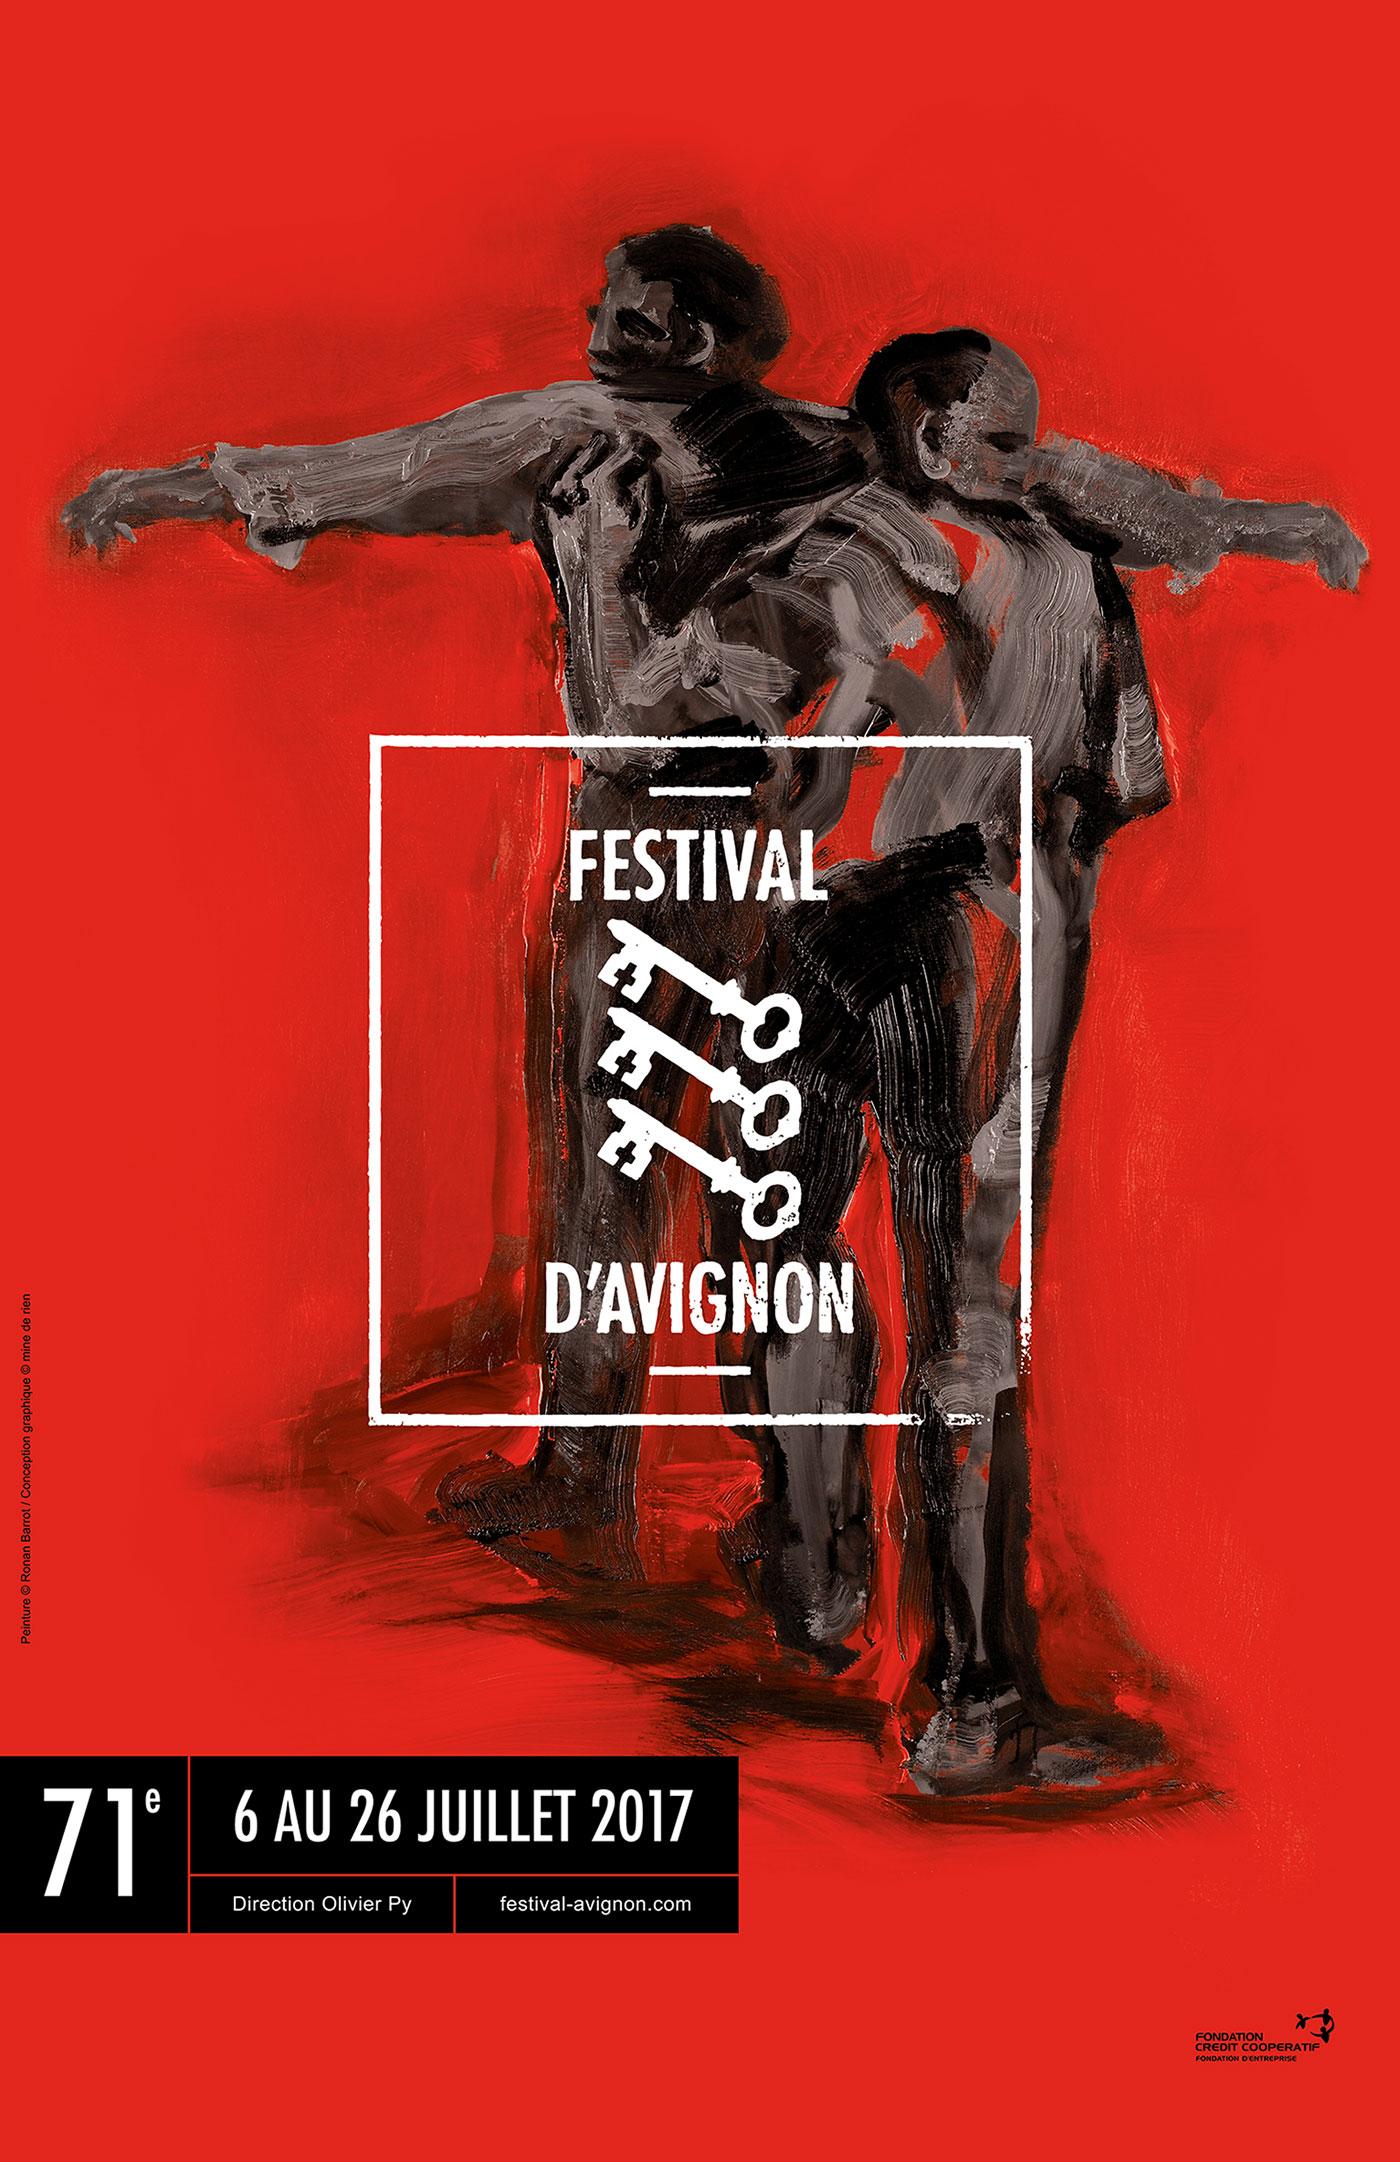 Festival d 39 avignon 2017 for Ouverture castorama avignon